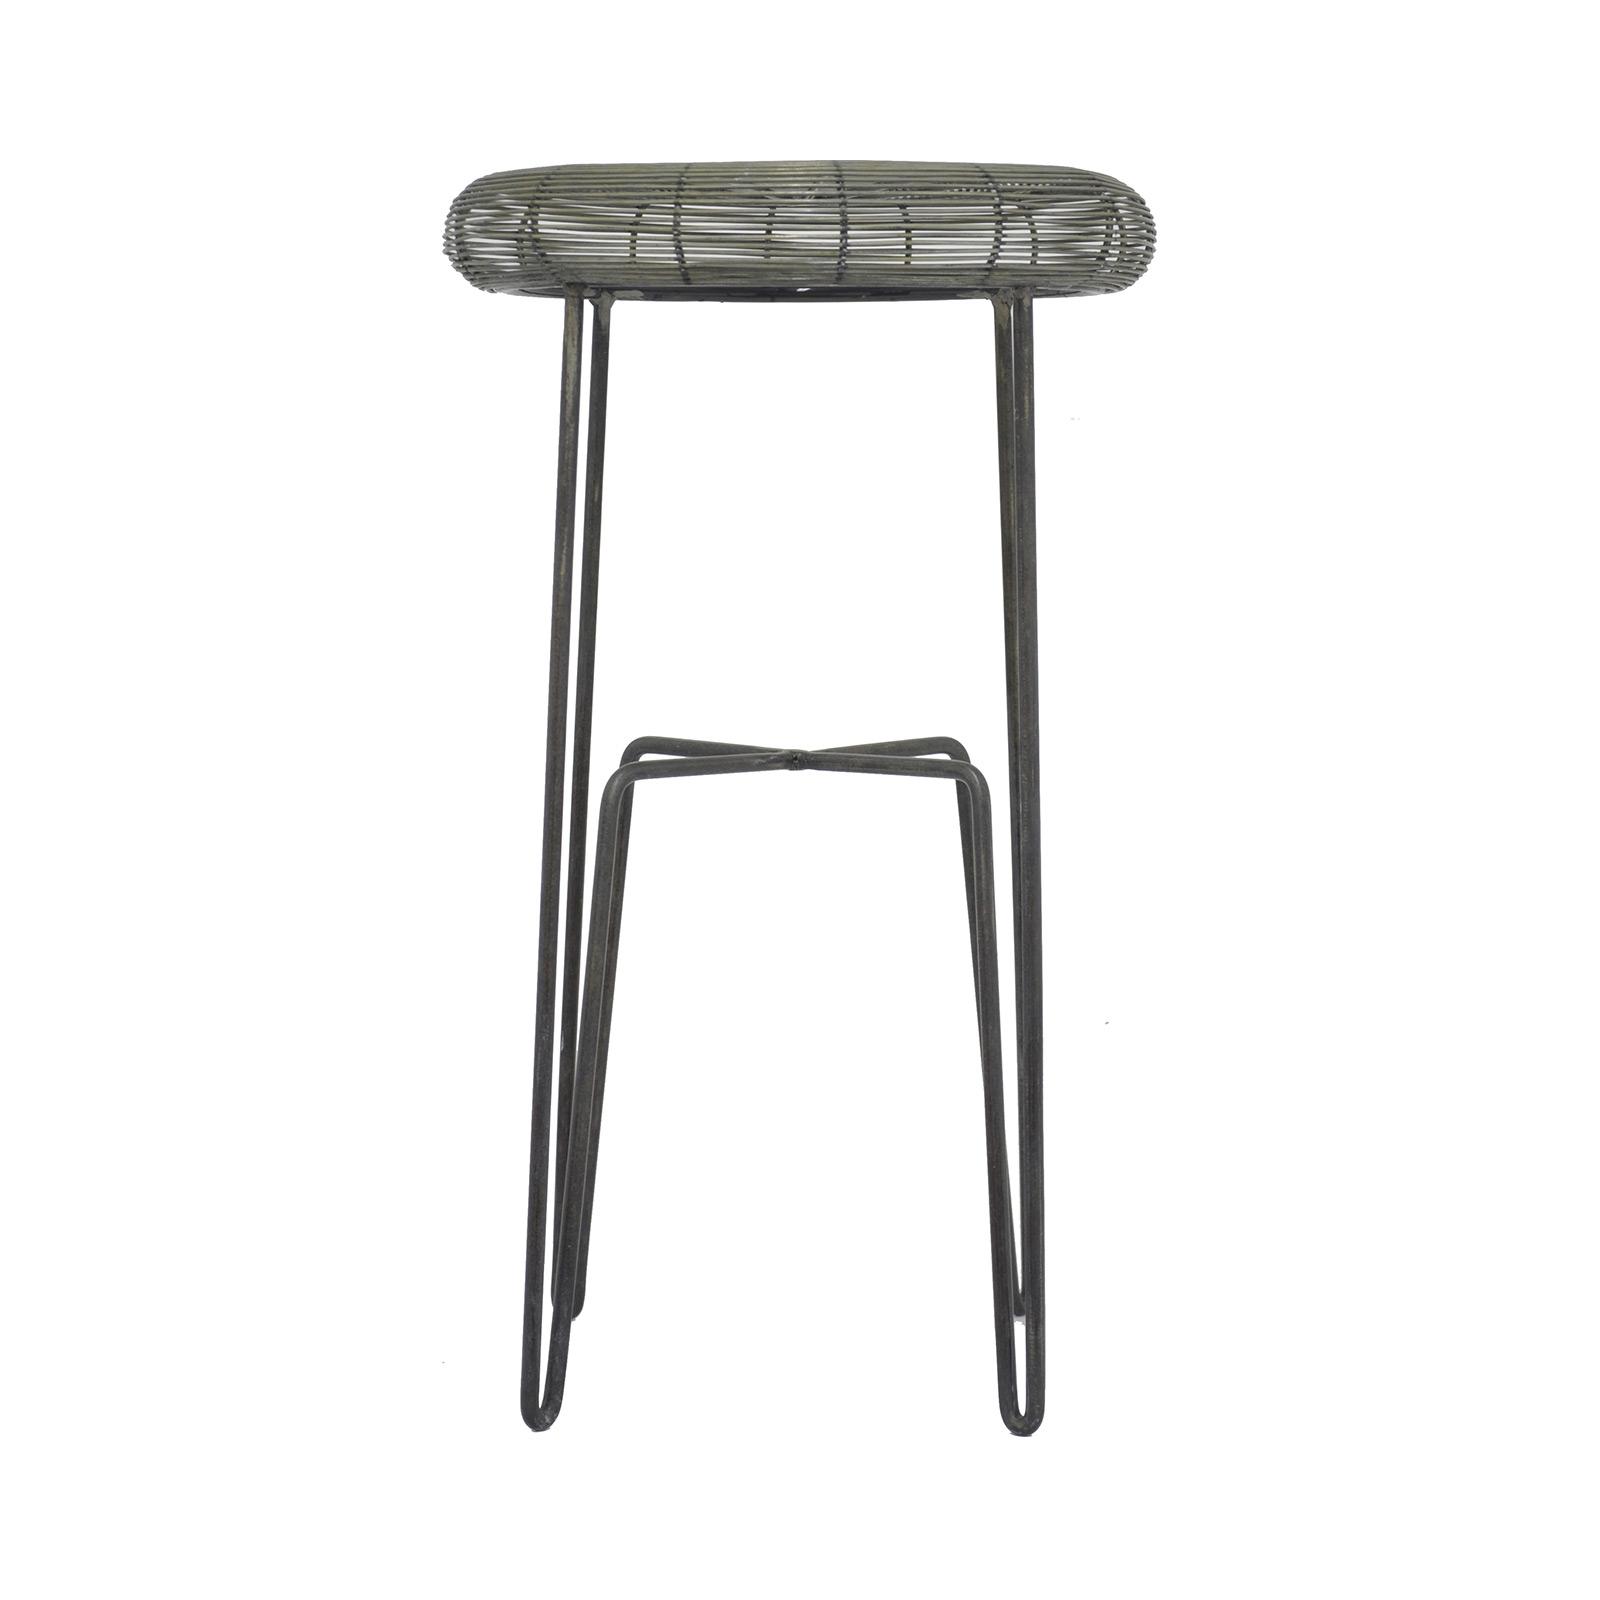 Sensational Bbgd Picks 9 Unique Barstools Under 100 Creativecarmelina Interior Chair Design Creativecarmelinacom